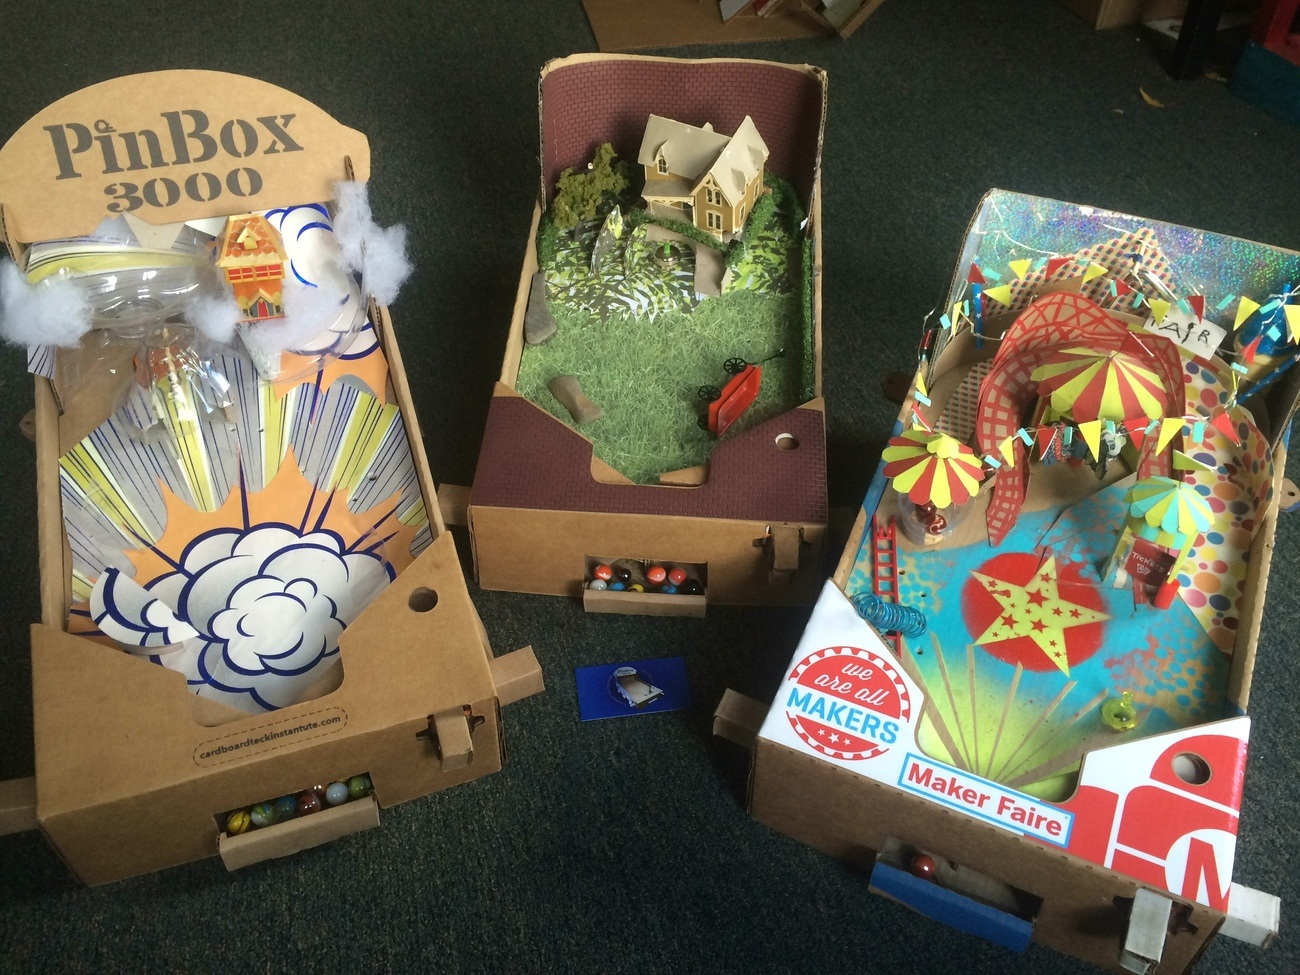 PinBox 3000 and Gamechanger